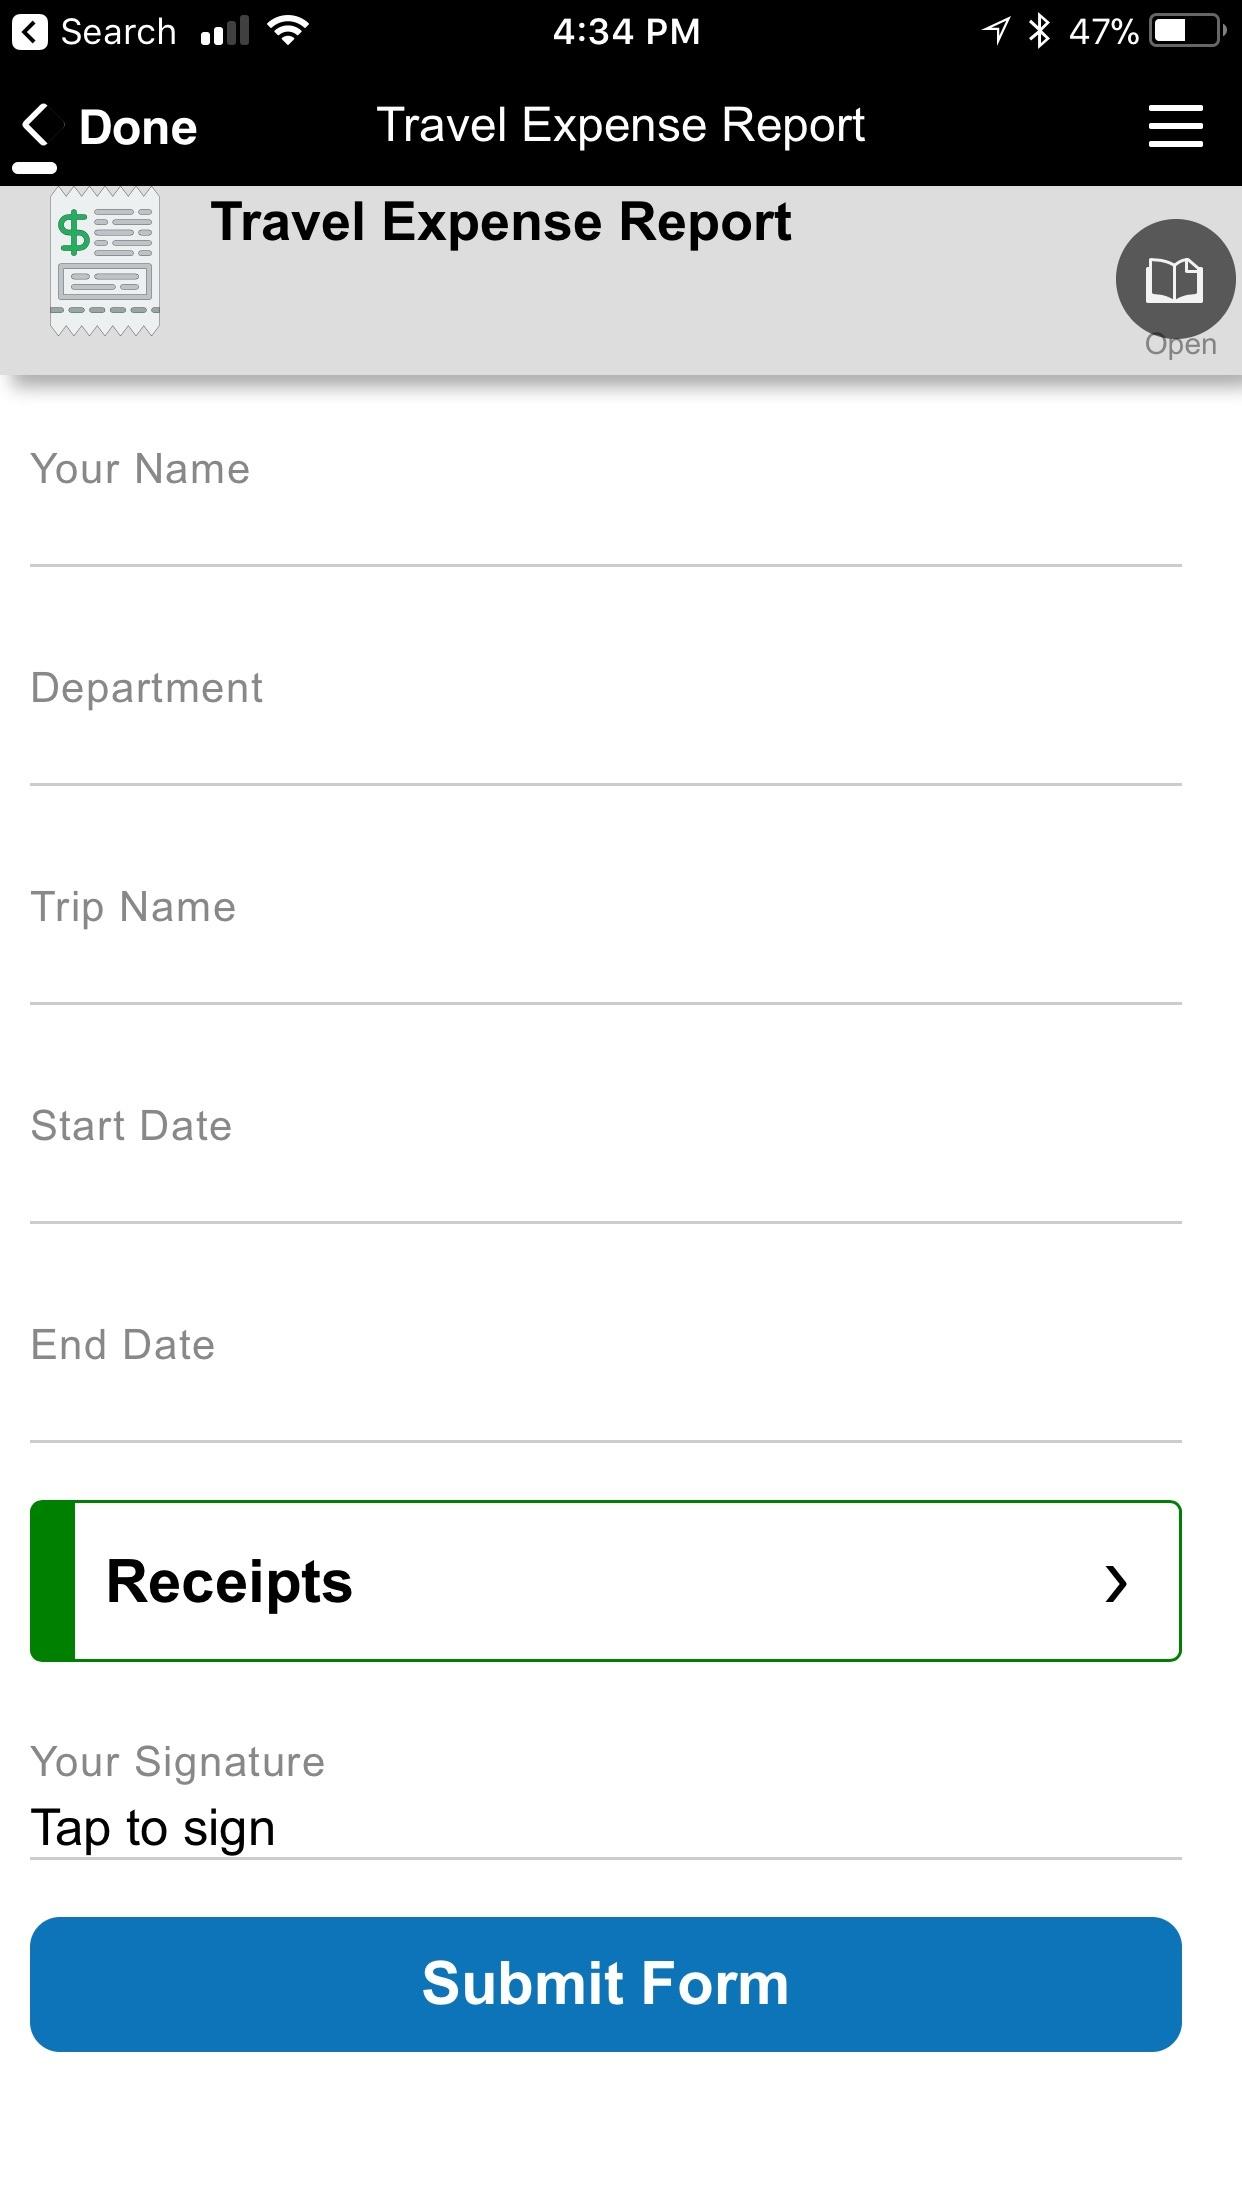 TransForm Travel Expense Rpt.jpg